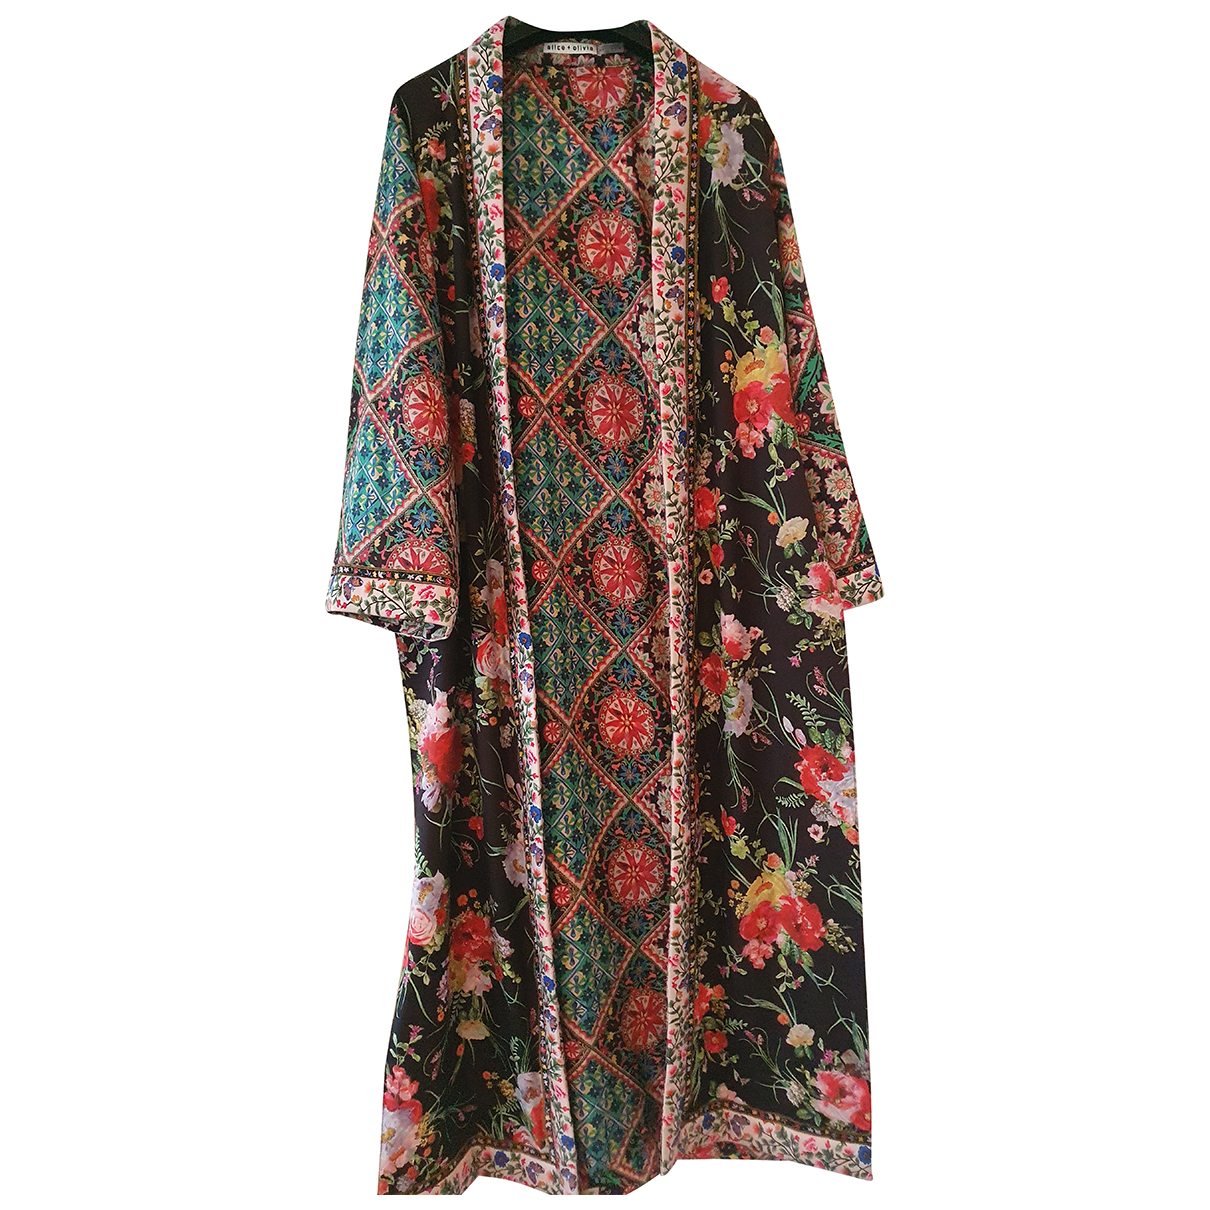 Alice & Olivia N Multicolour coat for Women One Size 0-5